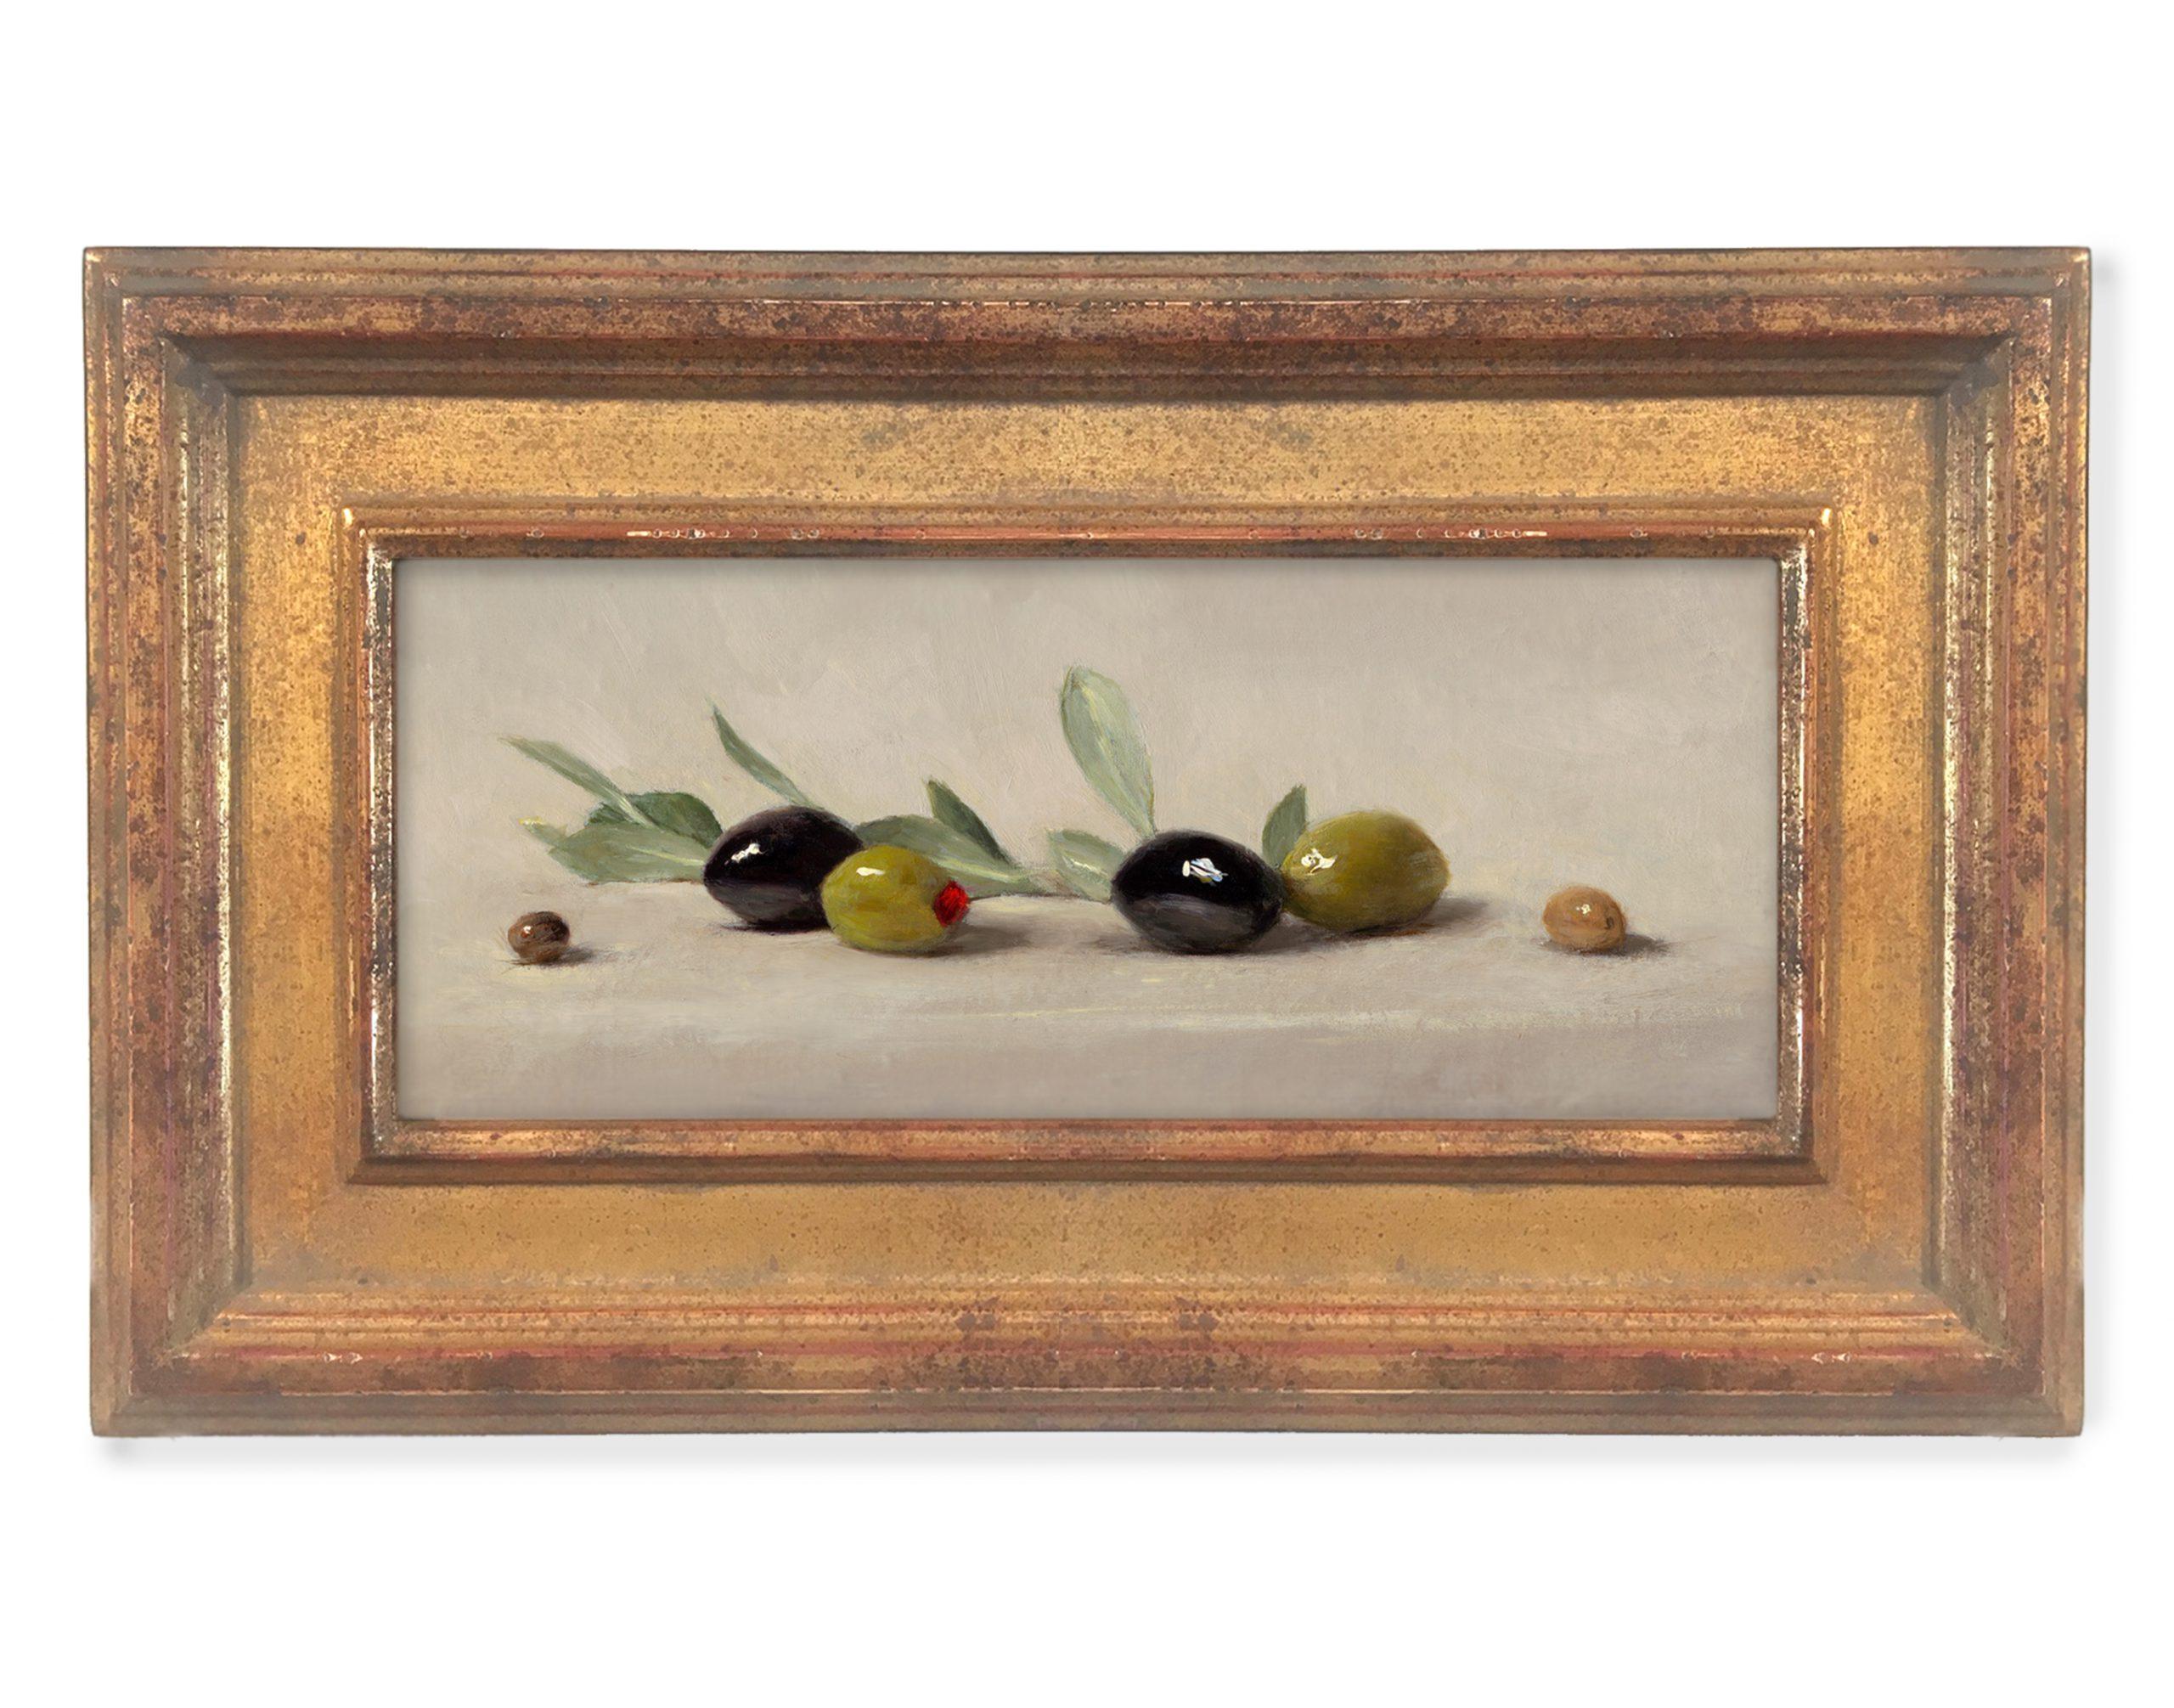 Sarah Lamb - Olives and Leaves